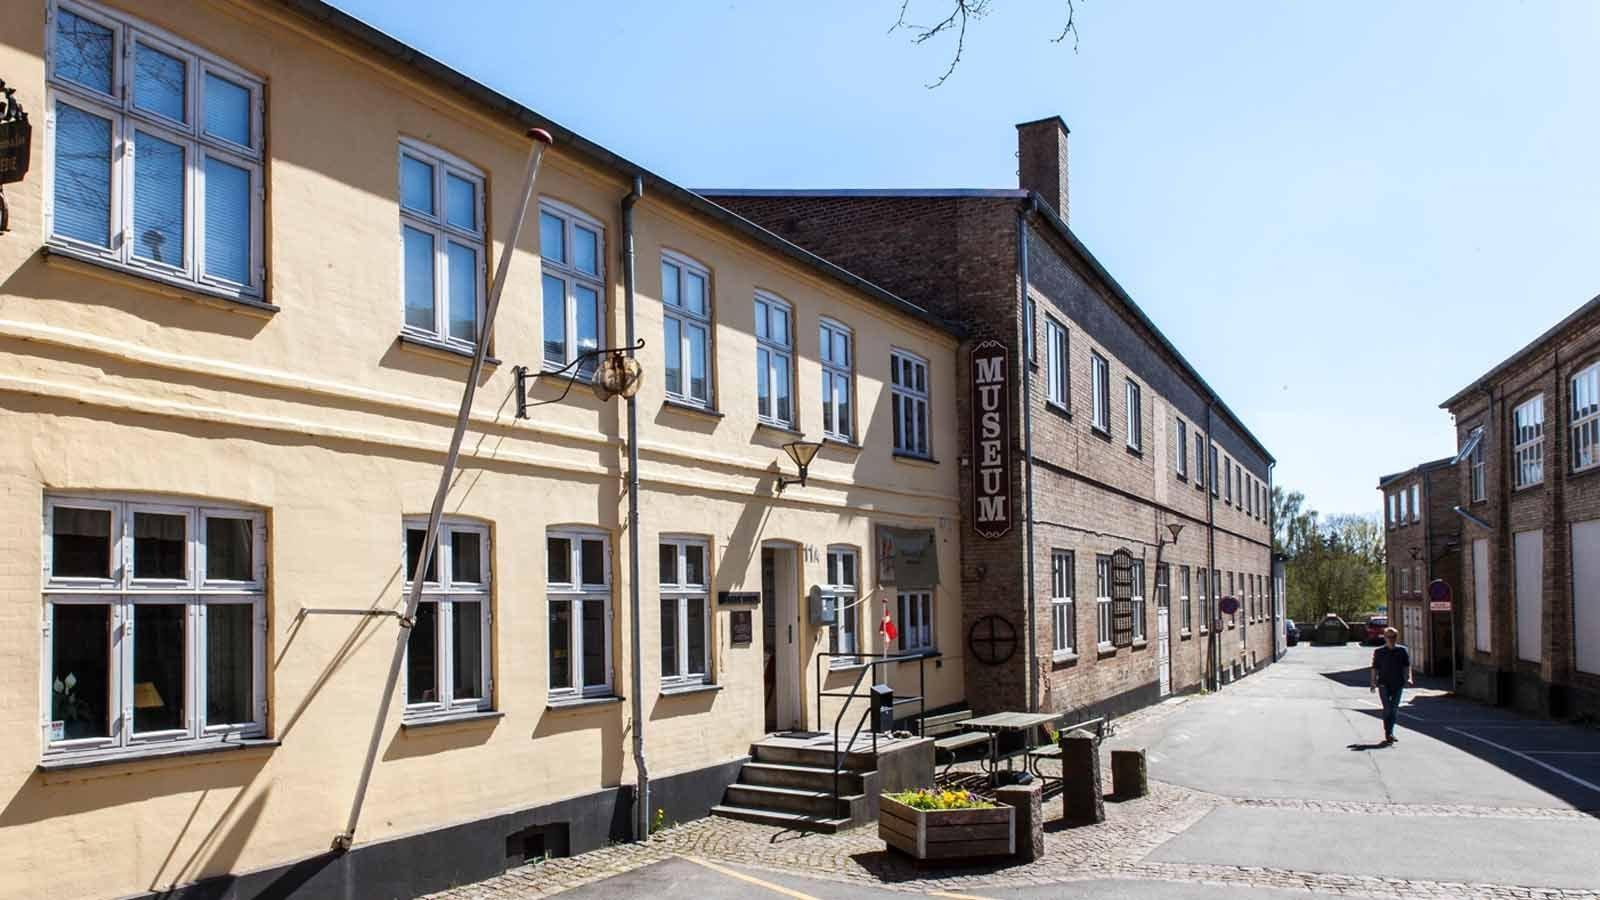 Slagelse Museum